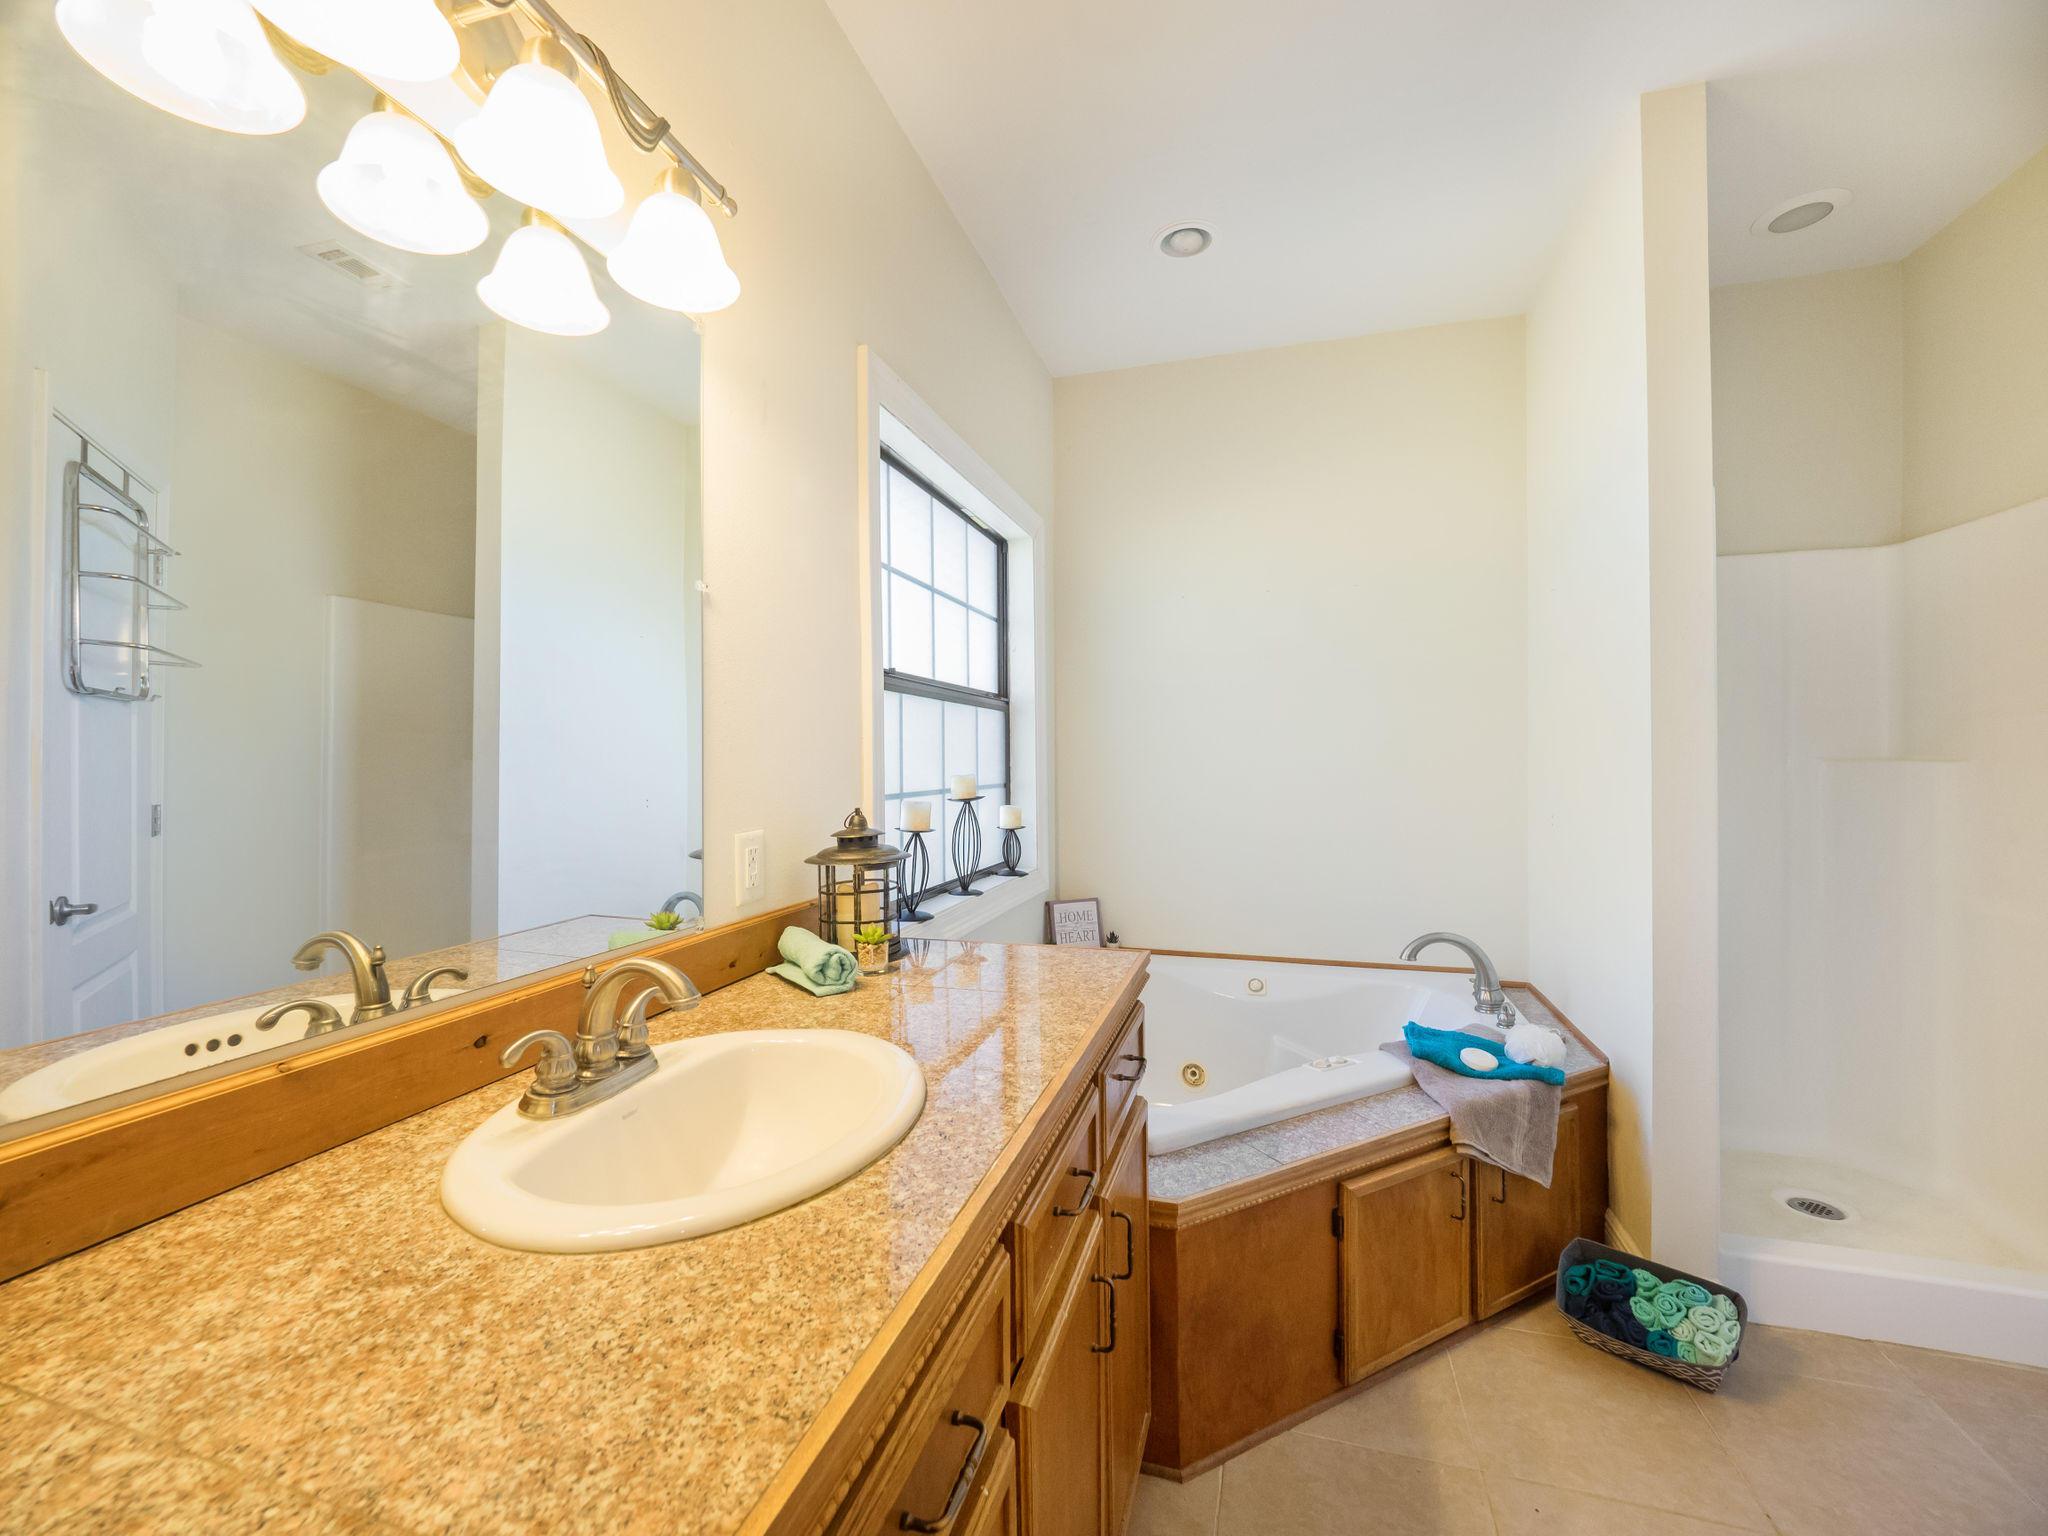 Anacoco home for sale, 428 East Lake Rd., Anacoco LA - $230,000